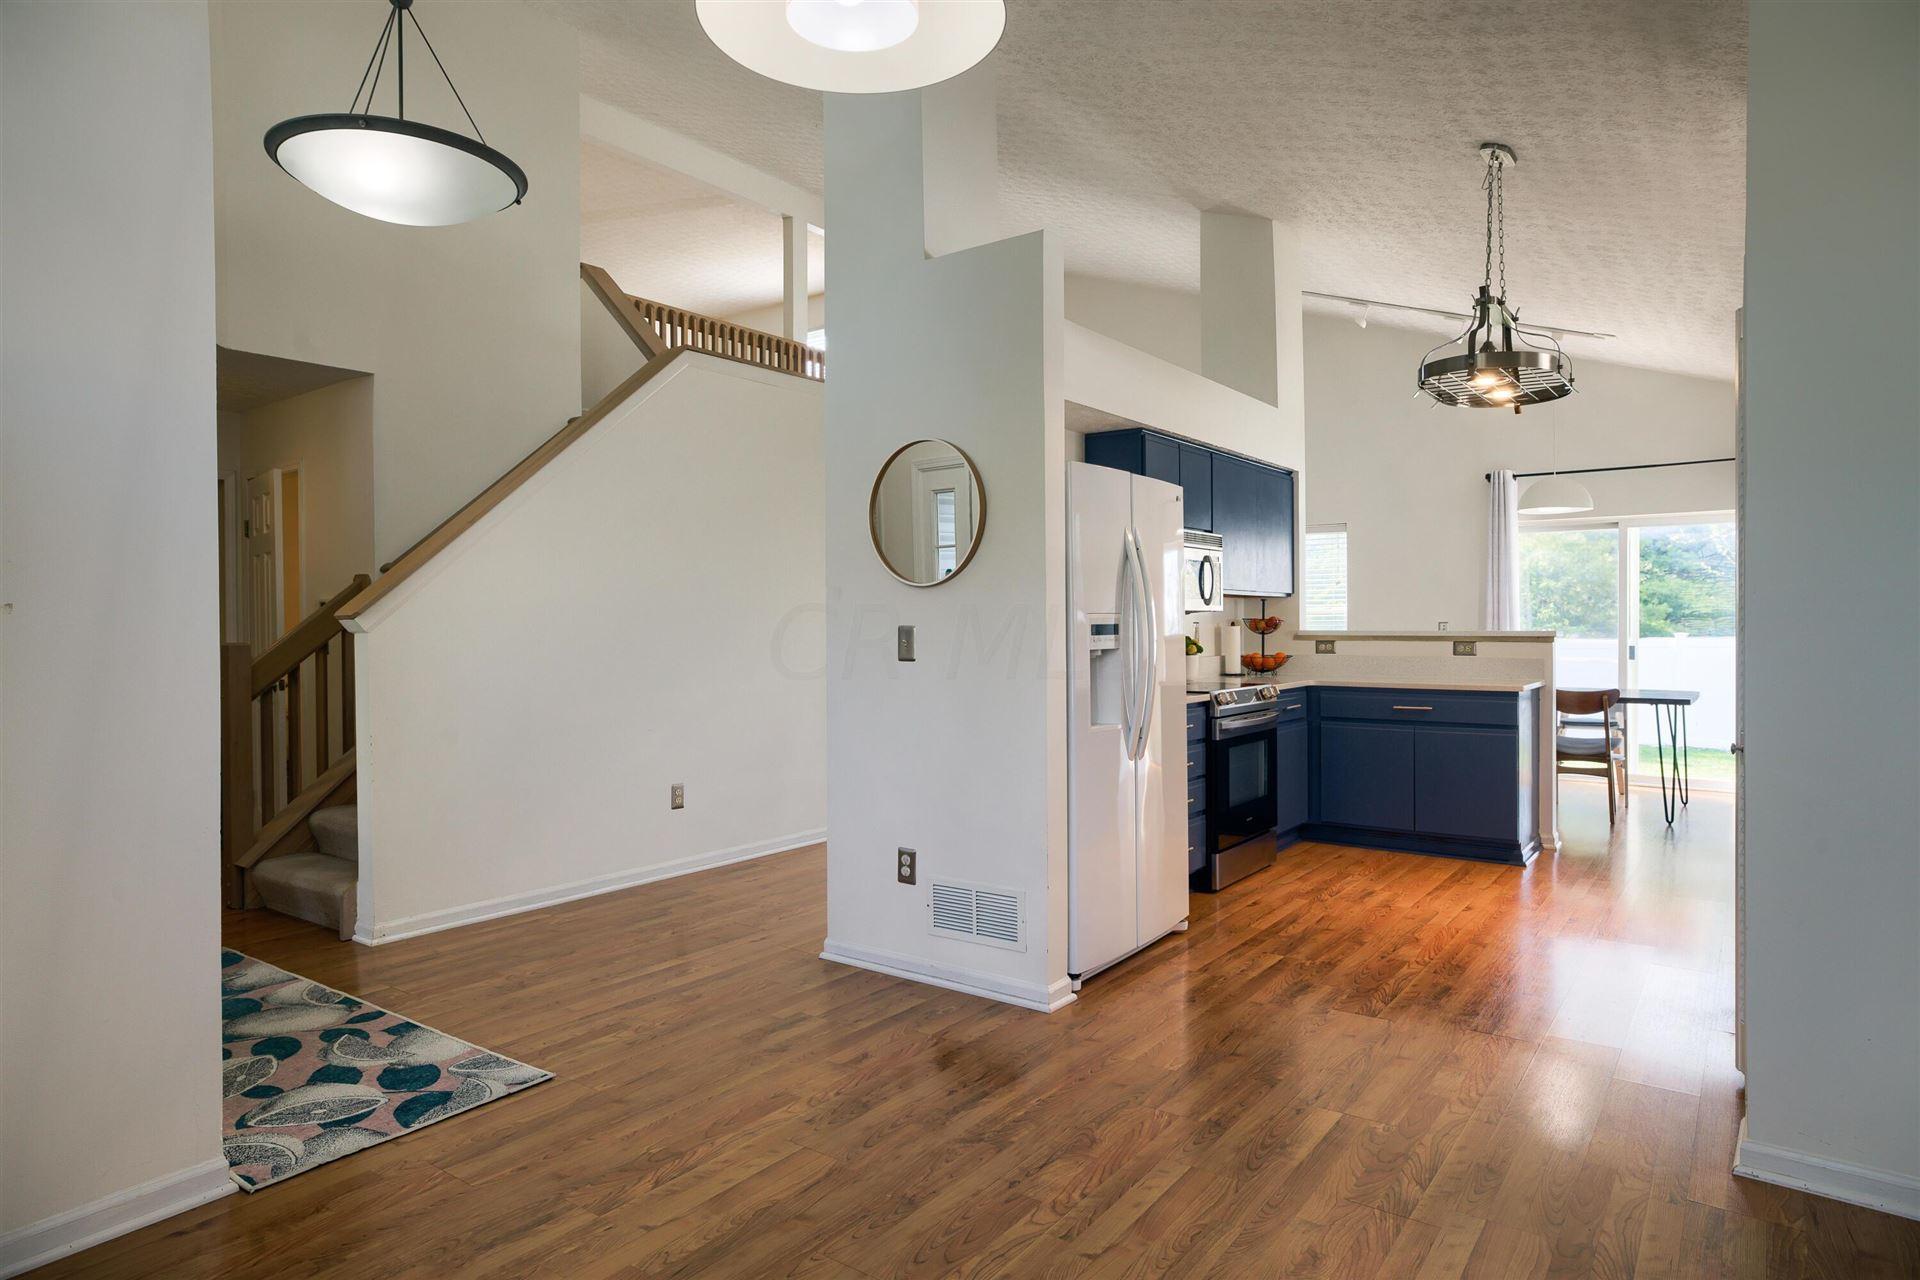 Photo of 7452 Liberton Place, Worthington, OH 43085 (MLS # 221012993)